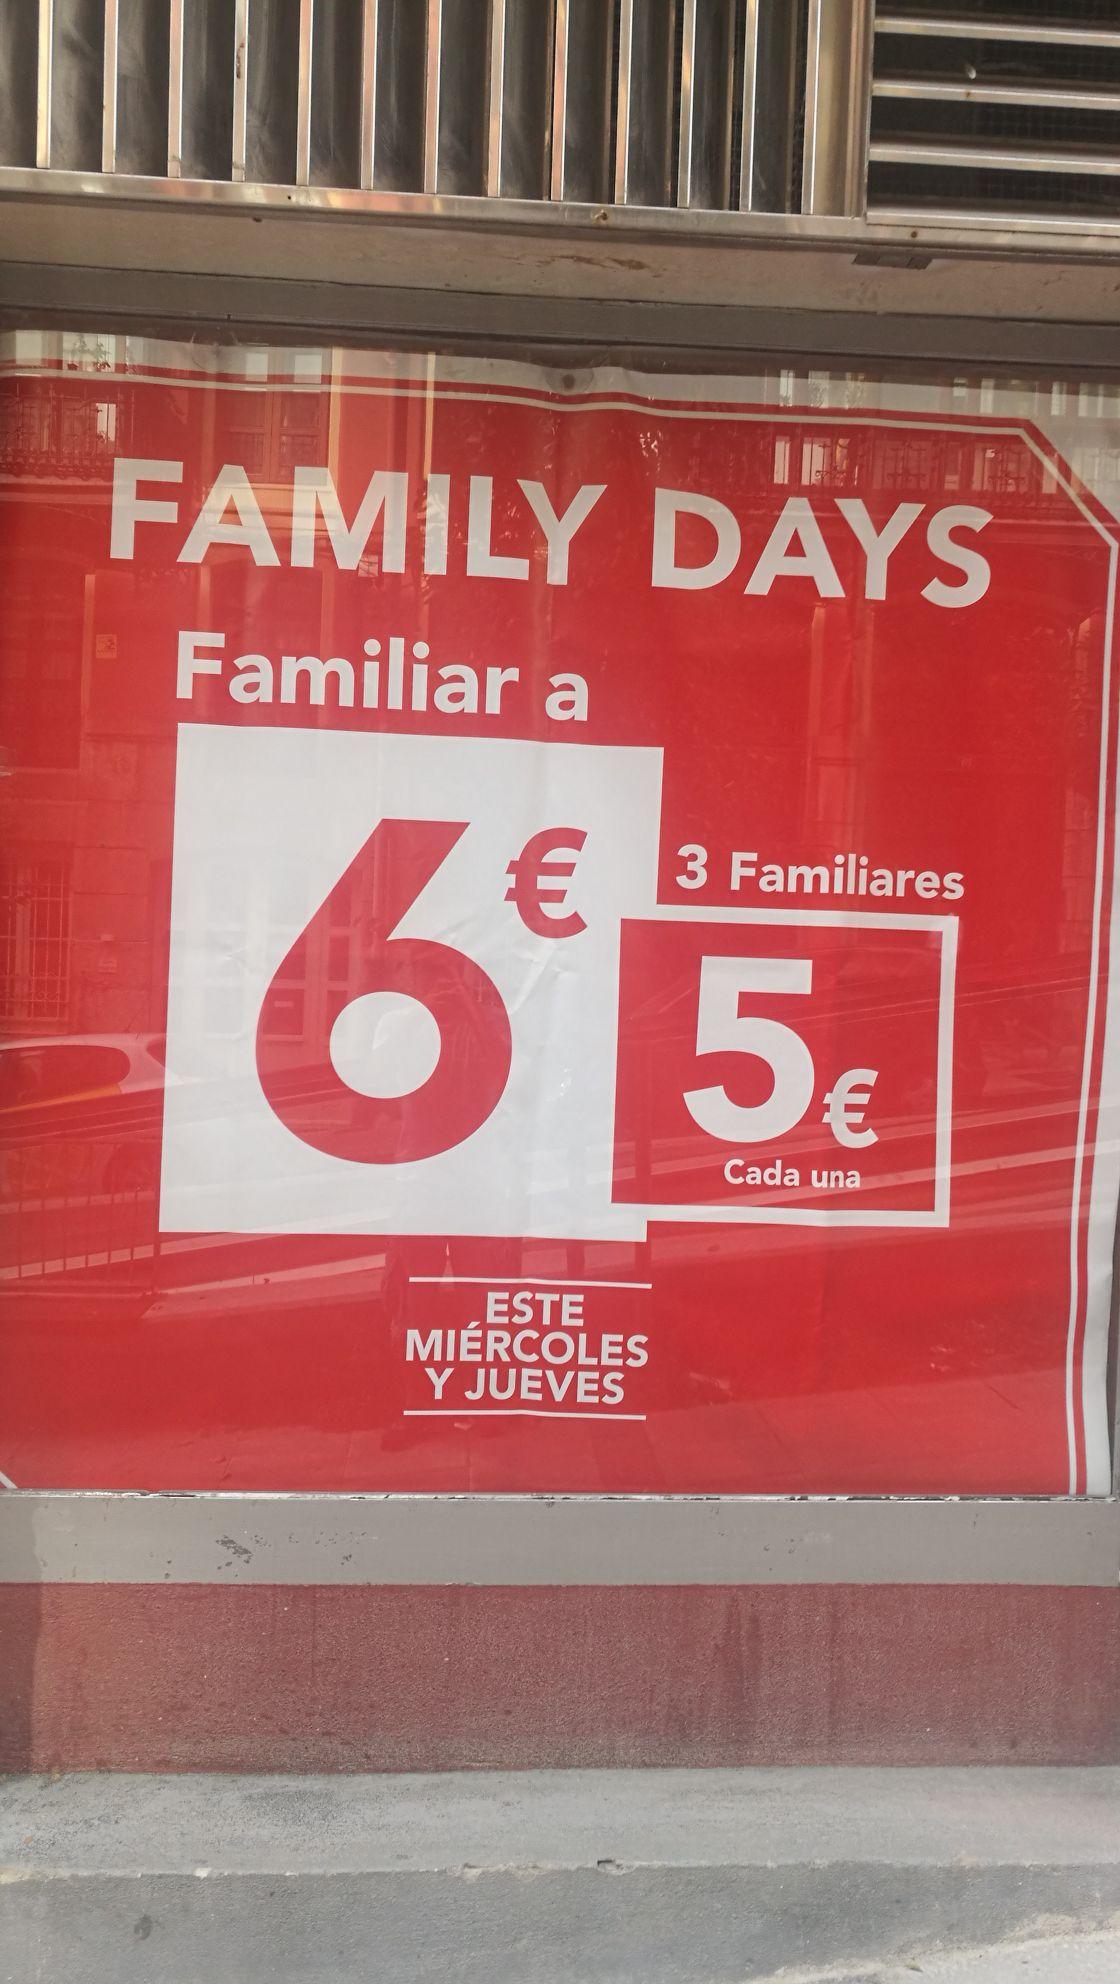 Tres familiares 15€ en family days de Telepizza